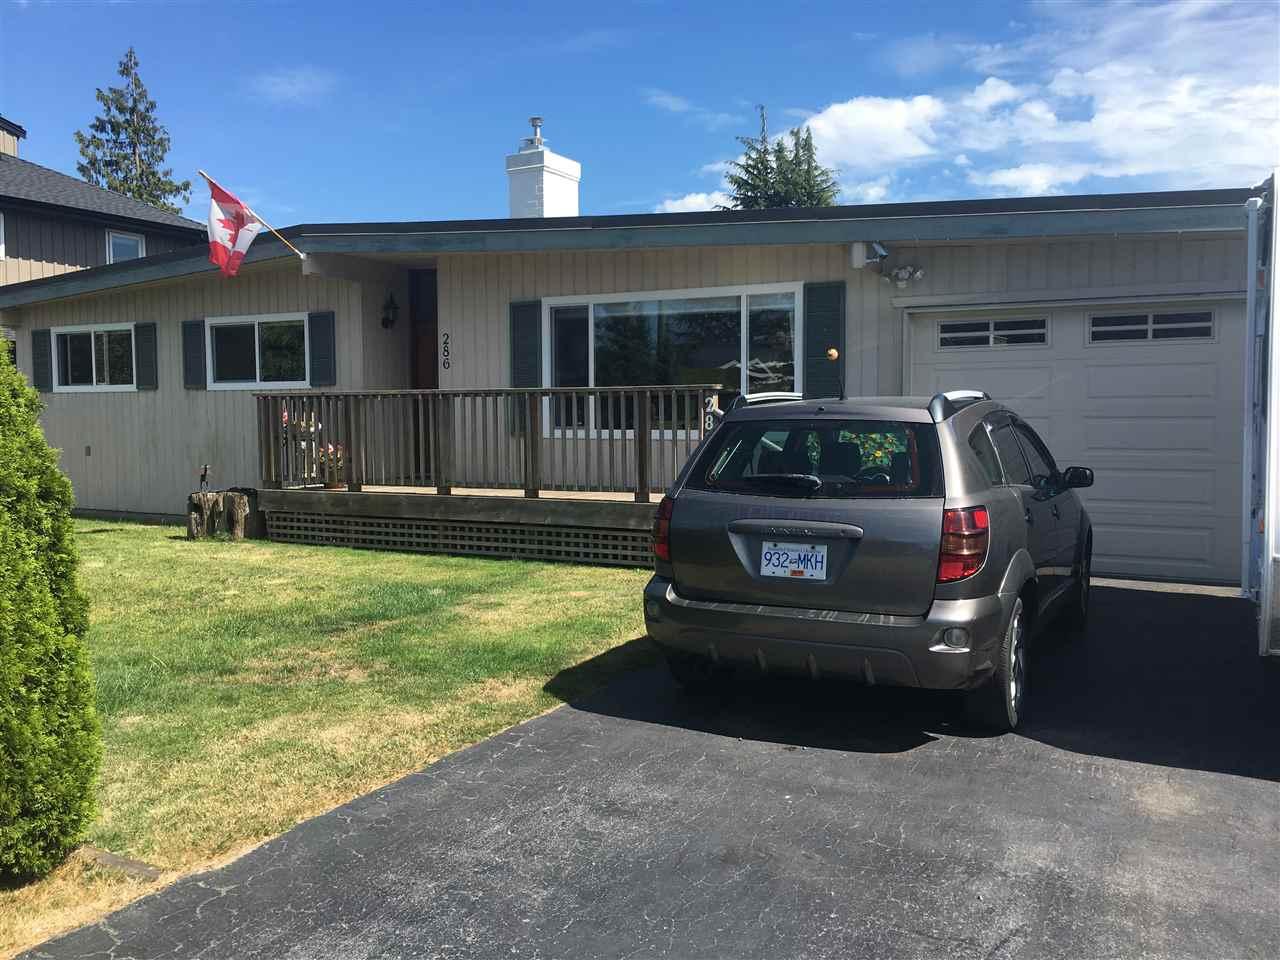 Detached at 286 66A STREET, Tsawwassen, British Columbia. Image 1